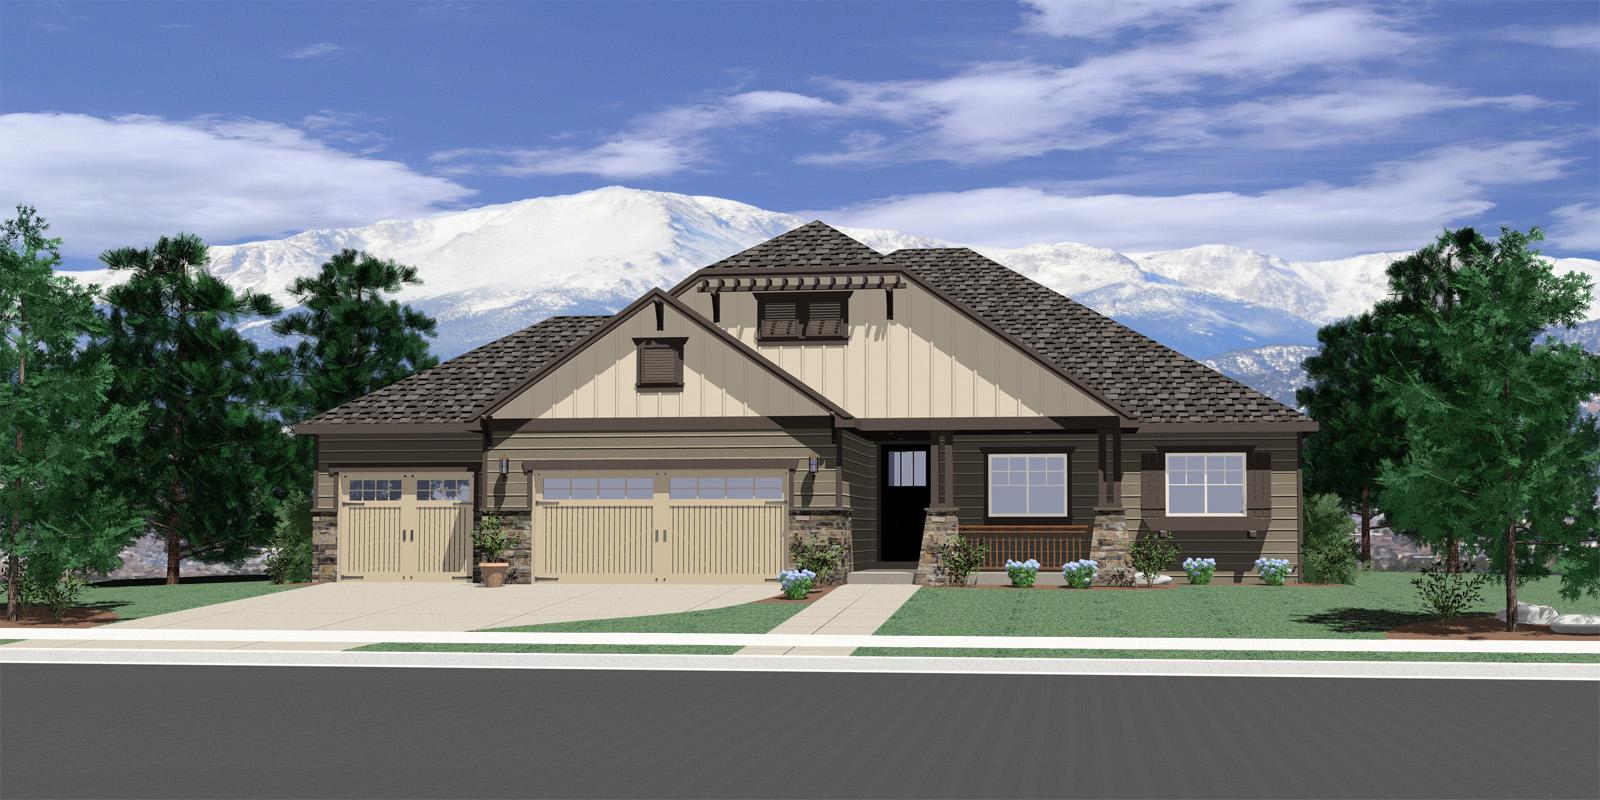 Floorplan,Single Family Home, Three Car Garage, Four Bedroom, Open Floor Plan,